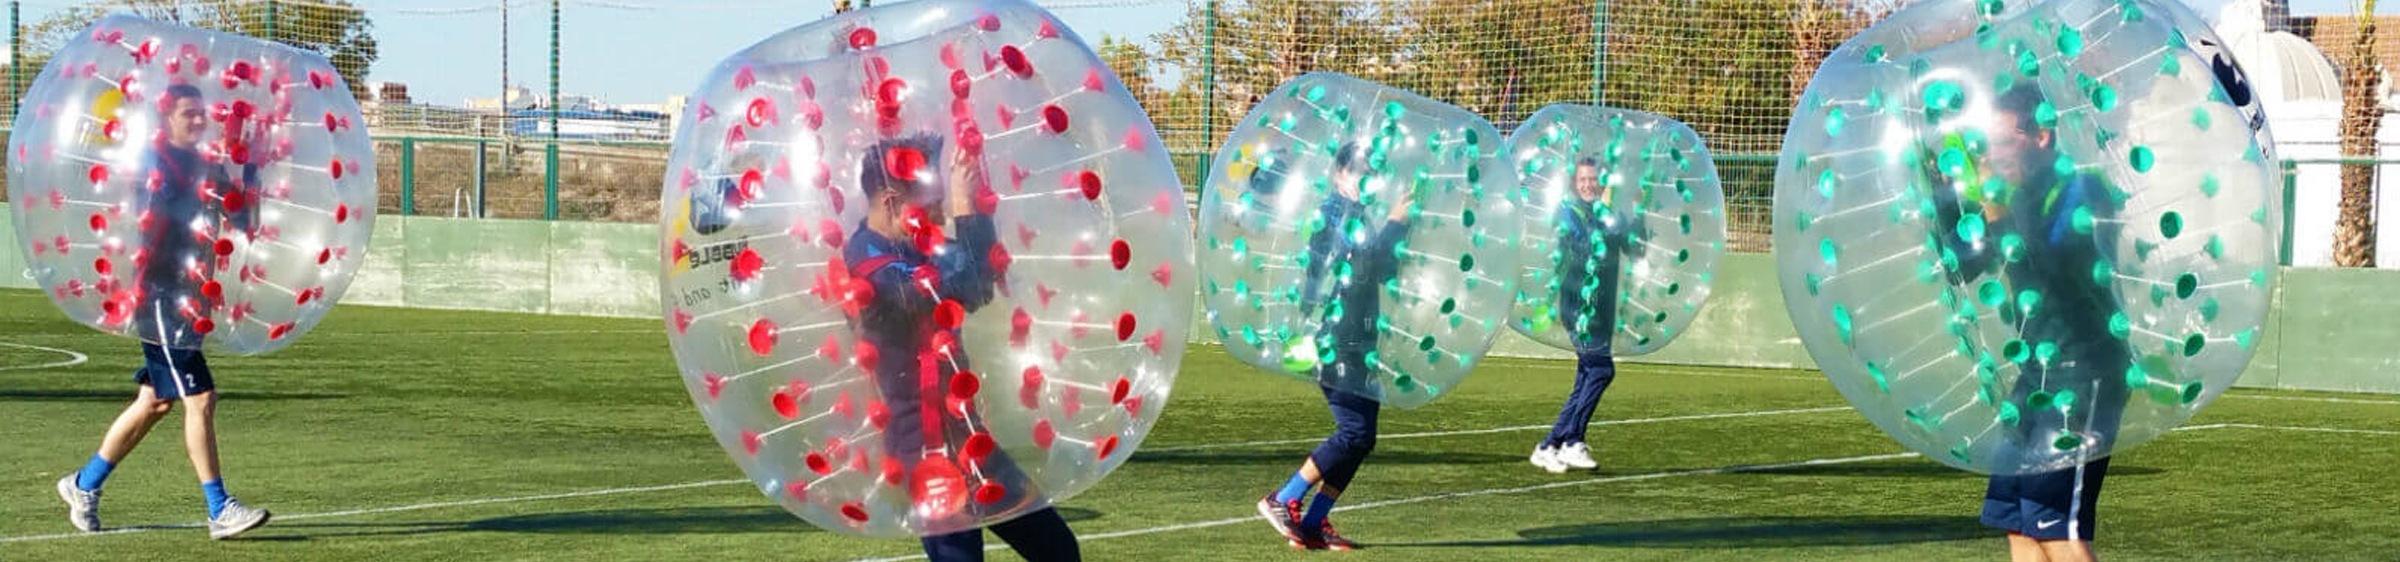 Giant Bubble Balls